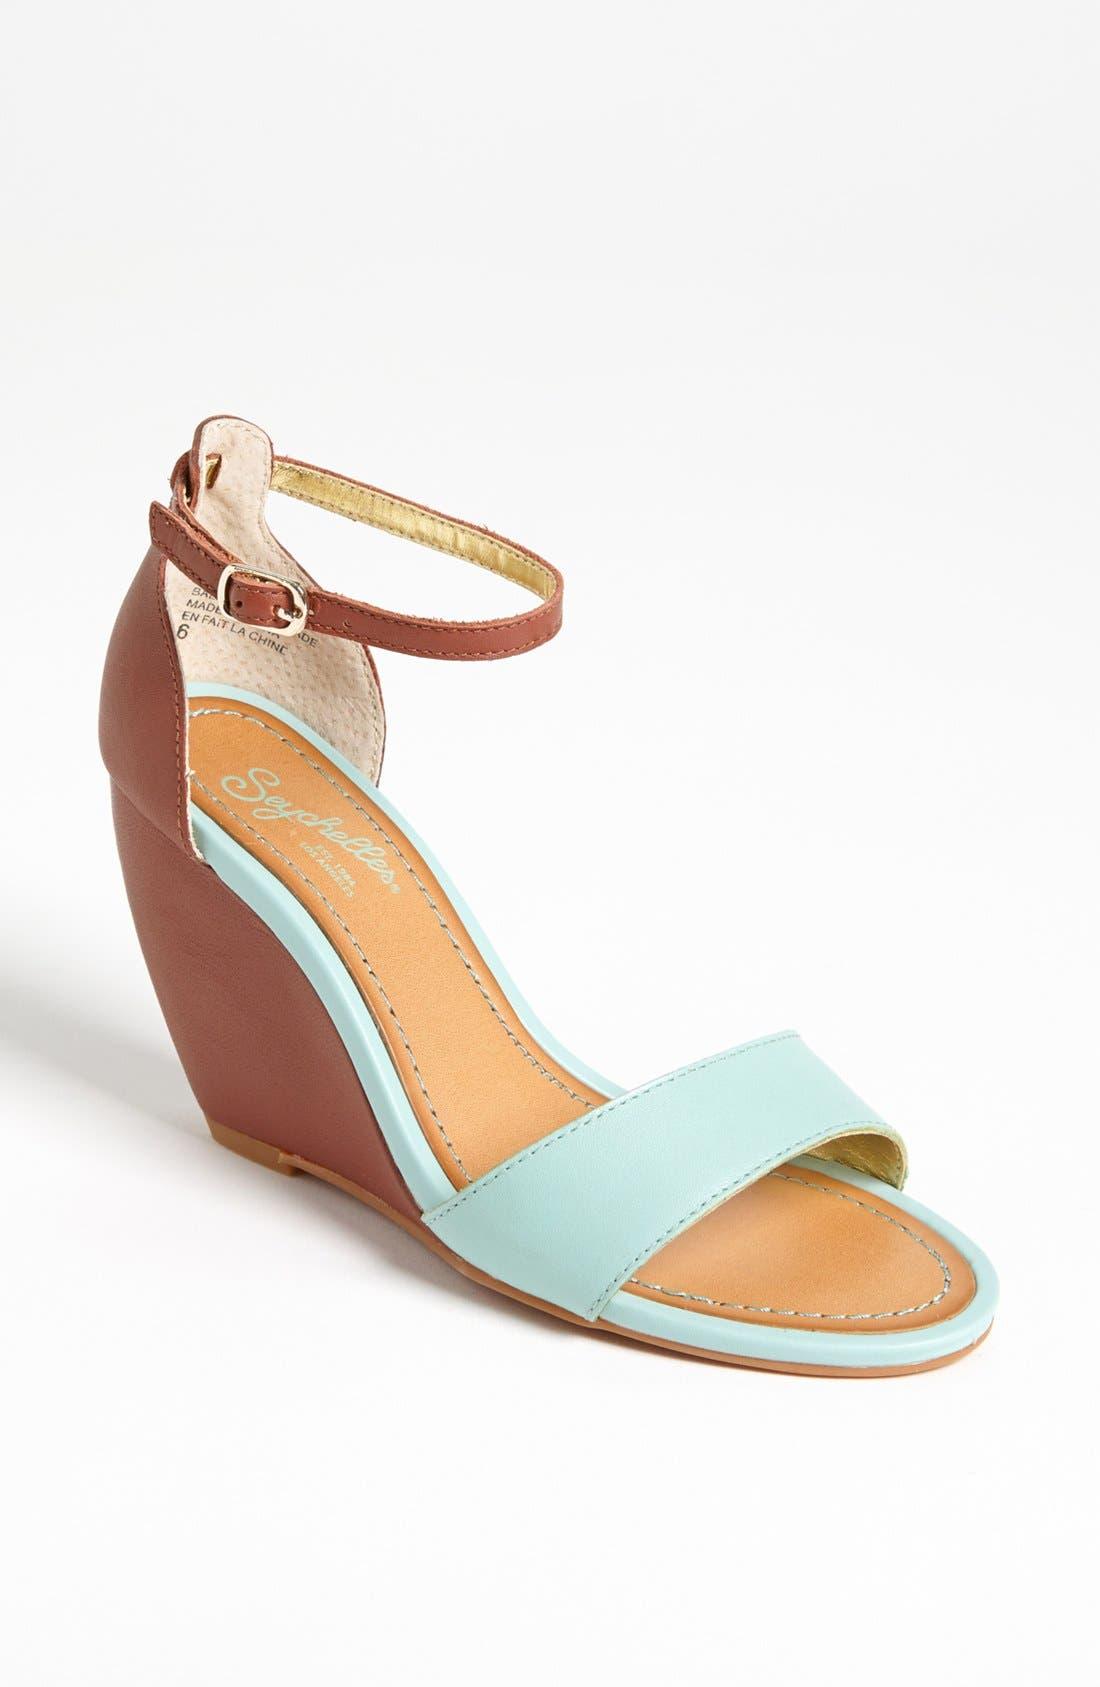 Alternate Image 1 Selected - Seychelles 'Thyme' Sandal